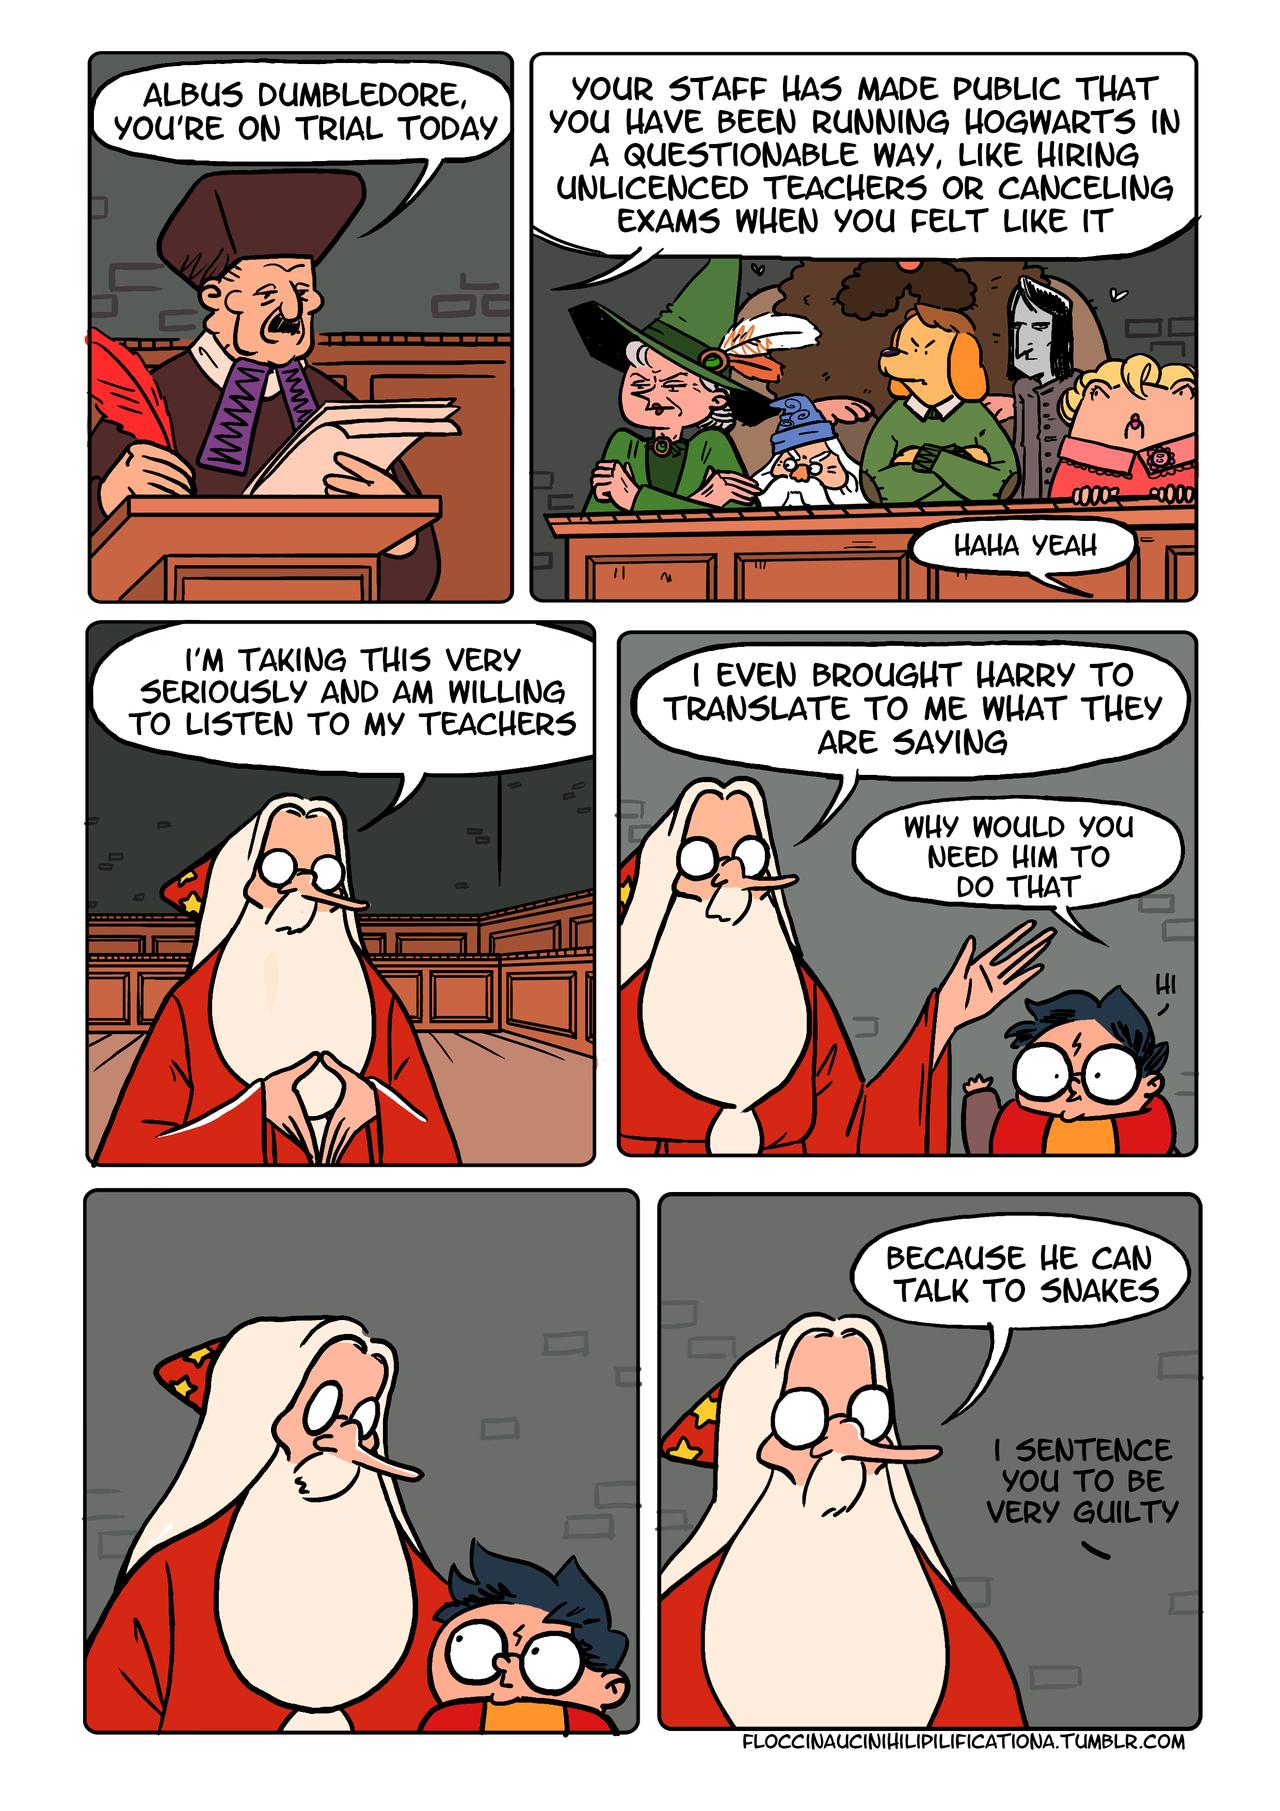 Dumbledor Against Ministry Of Magic Harry Potter Comics Harry Potter Funny Harry Potter Jokes